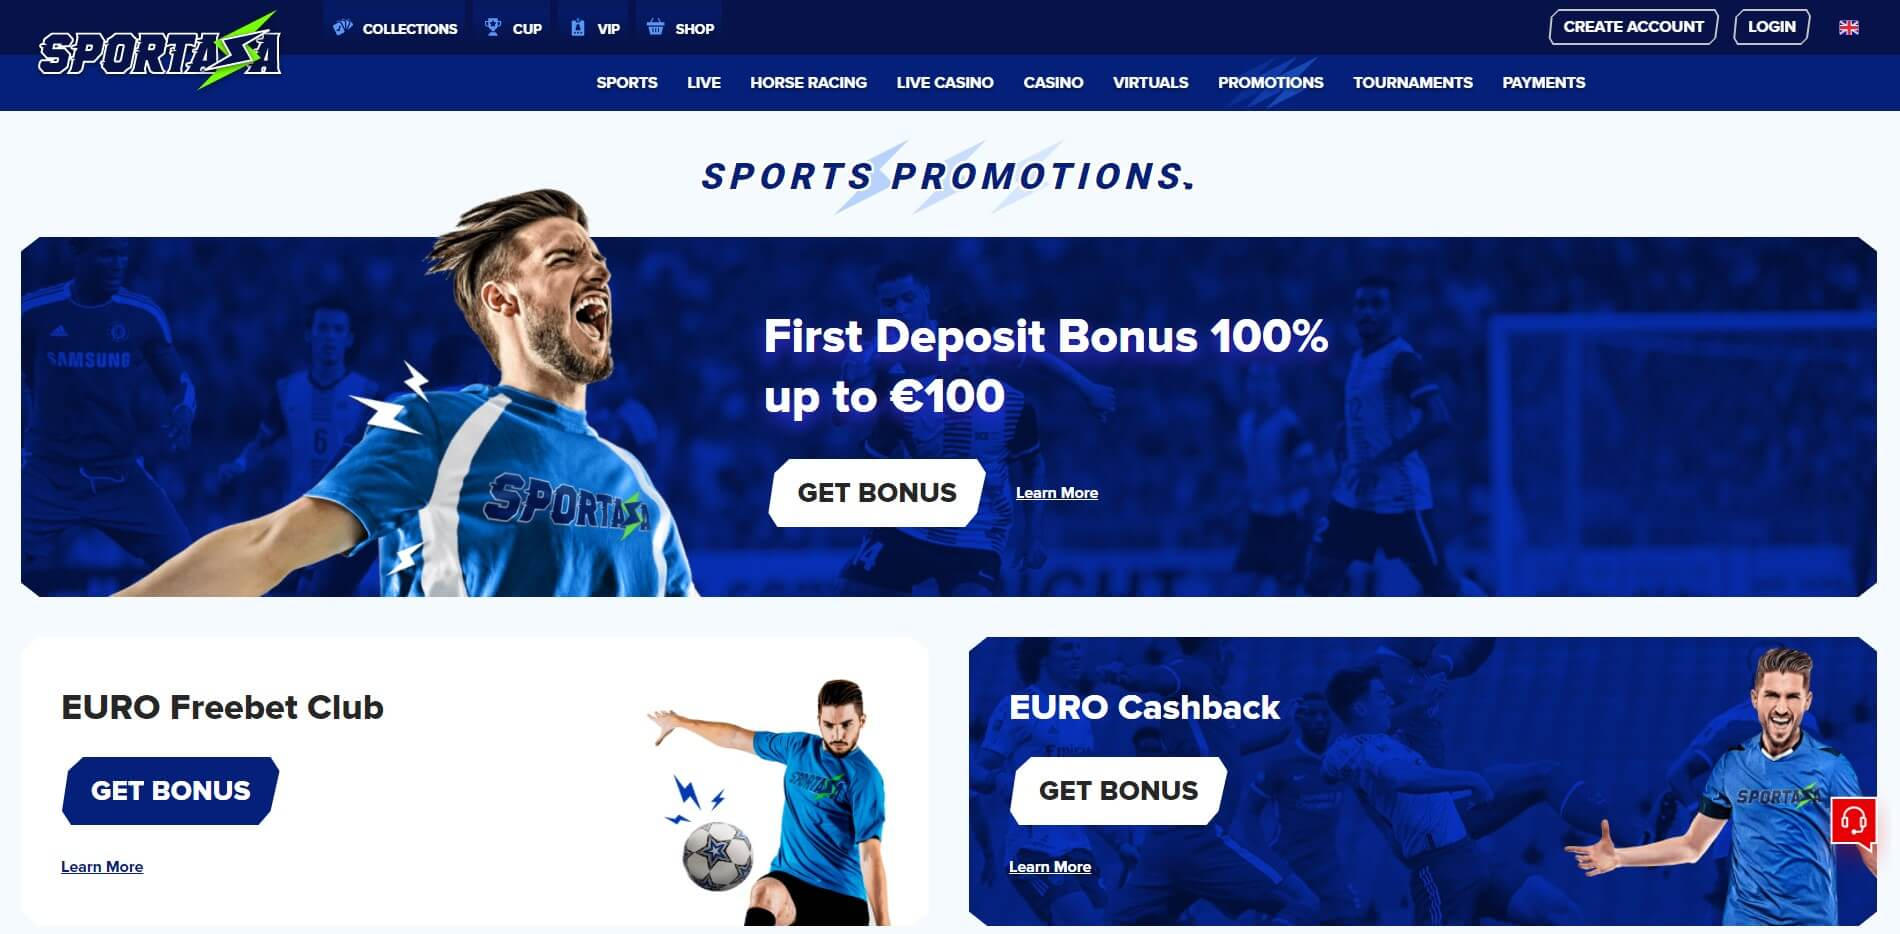 Promotions at Sportaza Casino